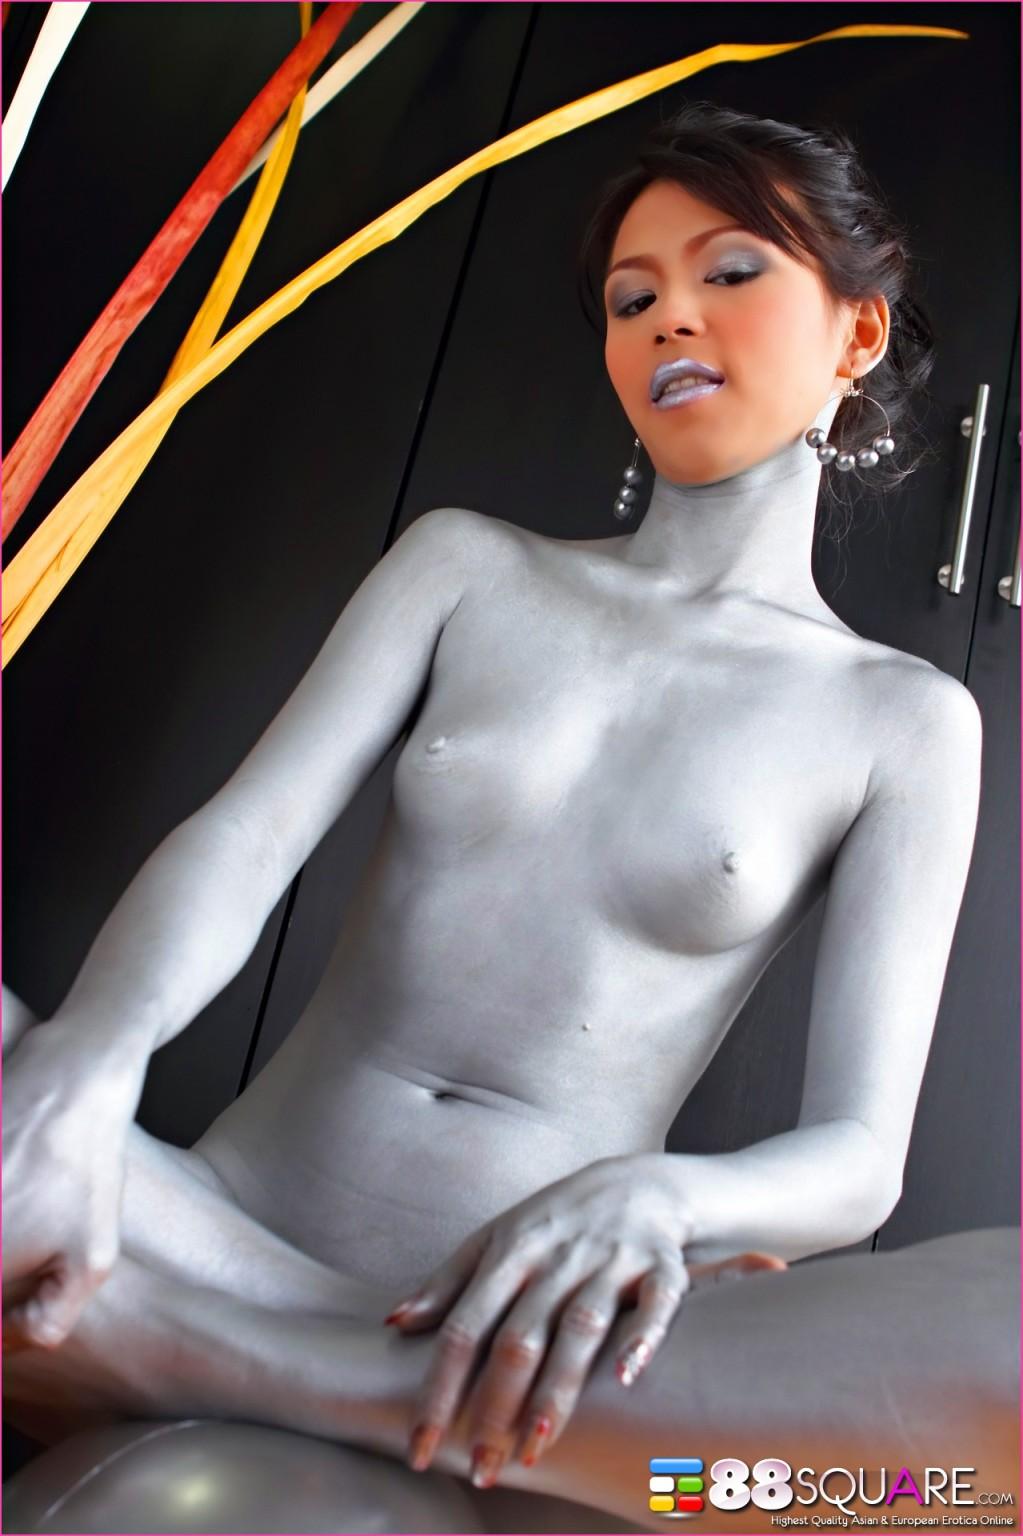 Naomi asian nude, under girl porn sex fuking